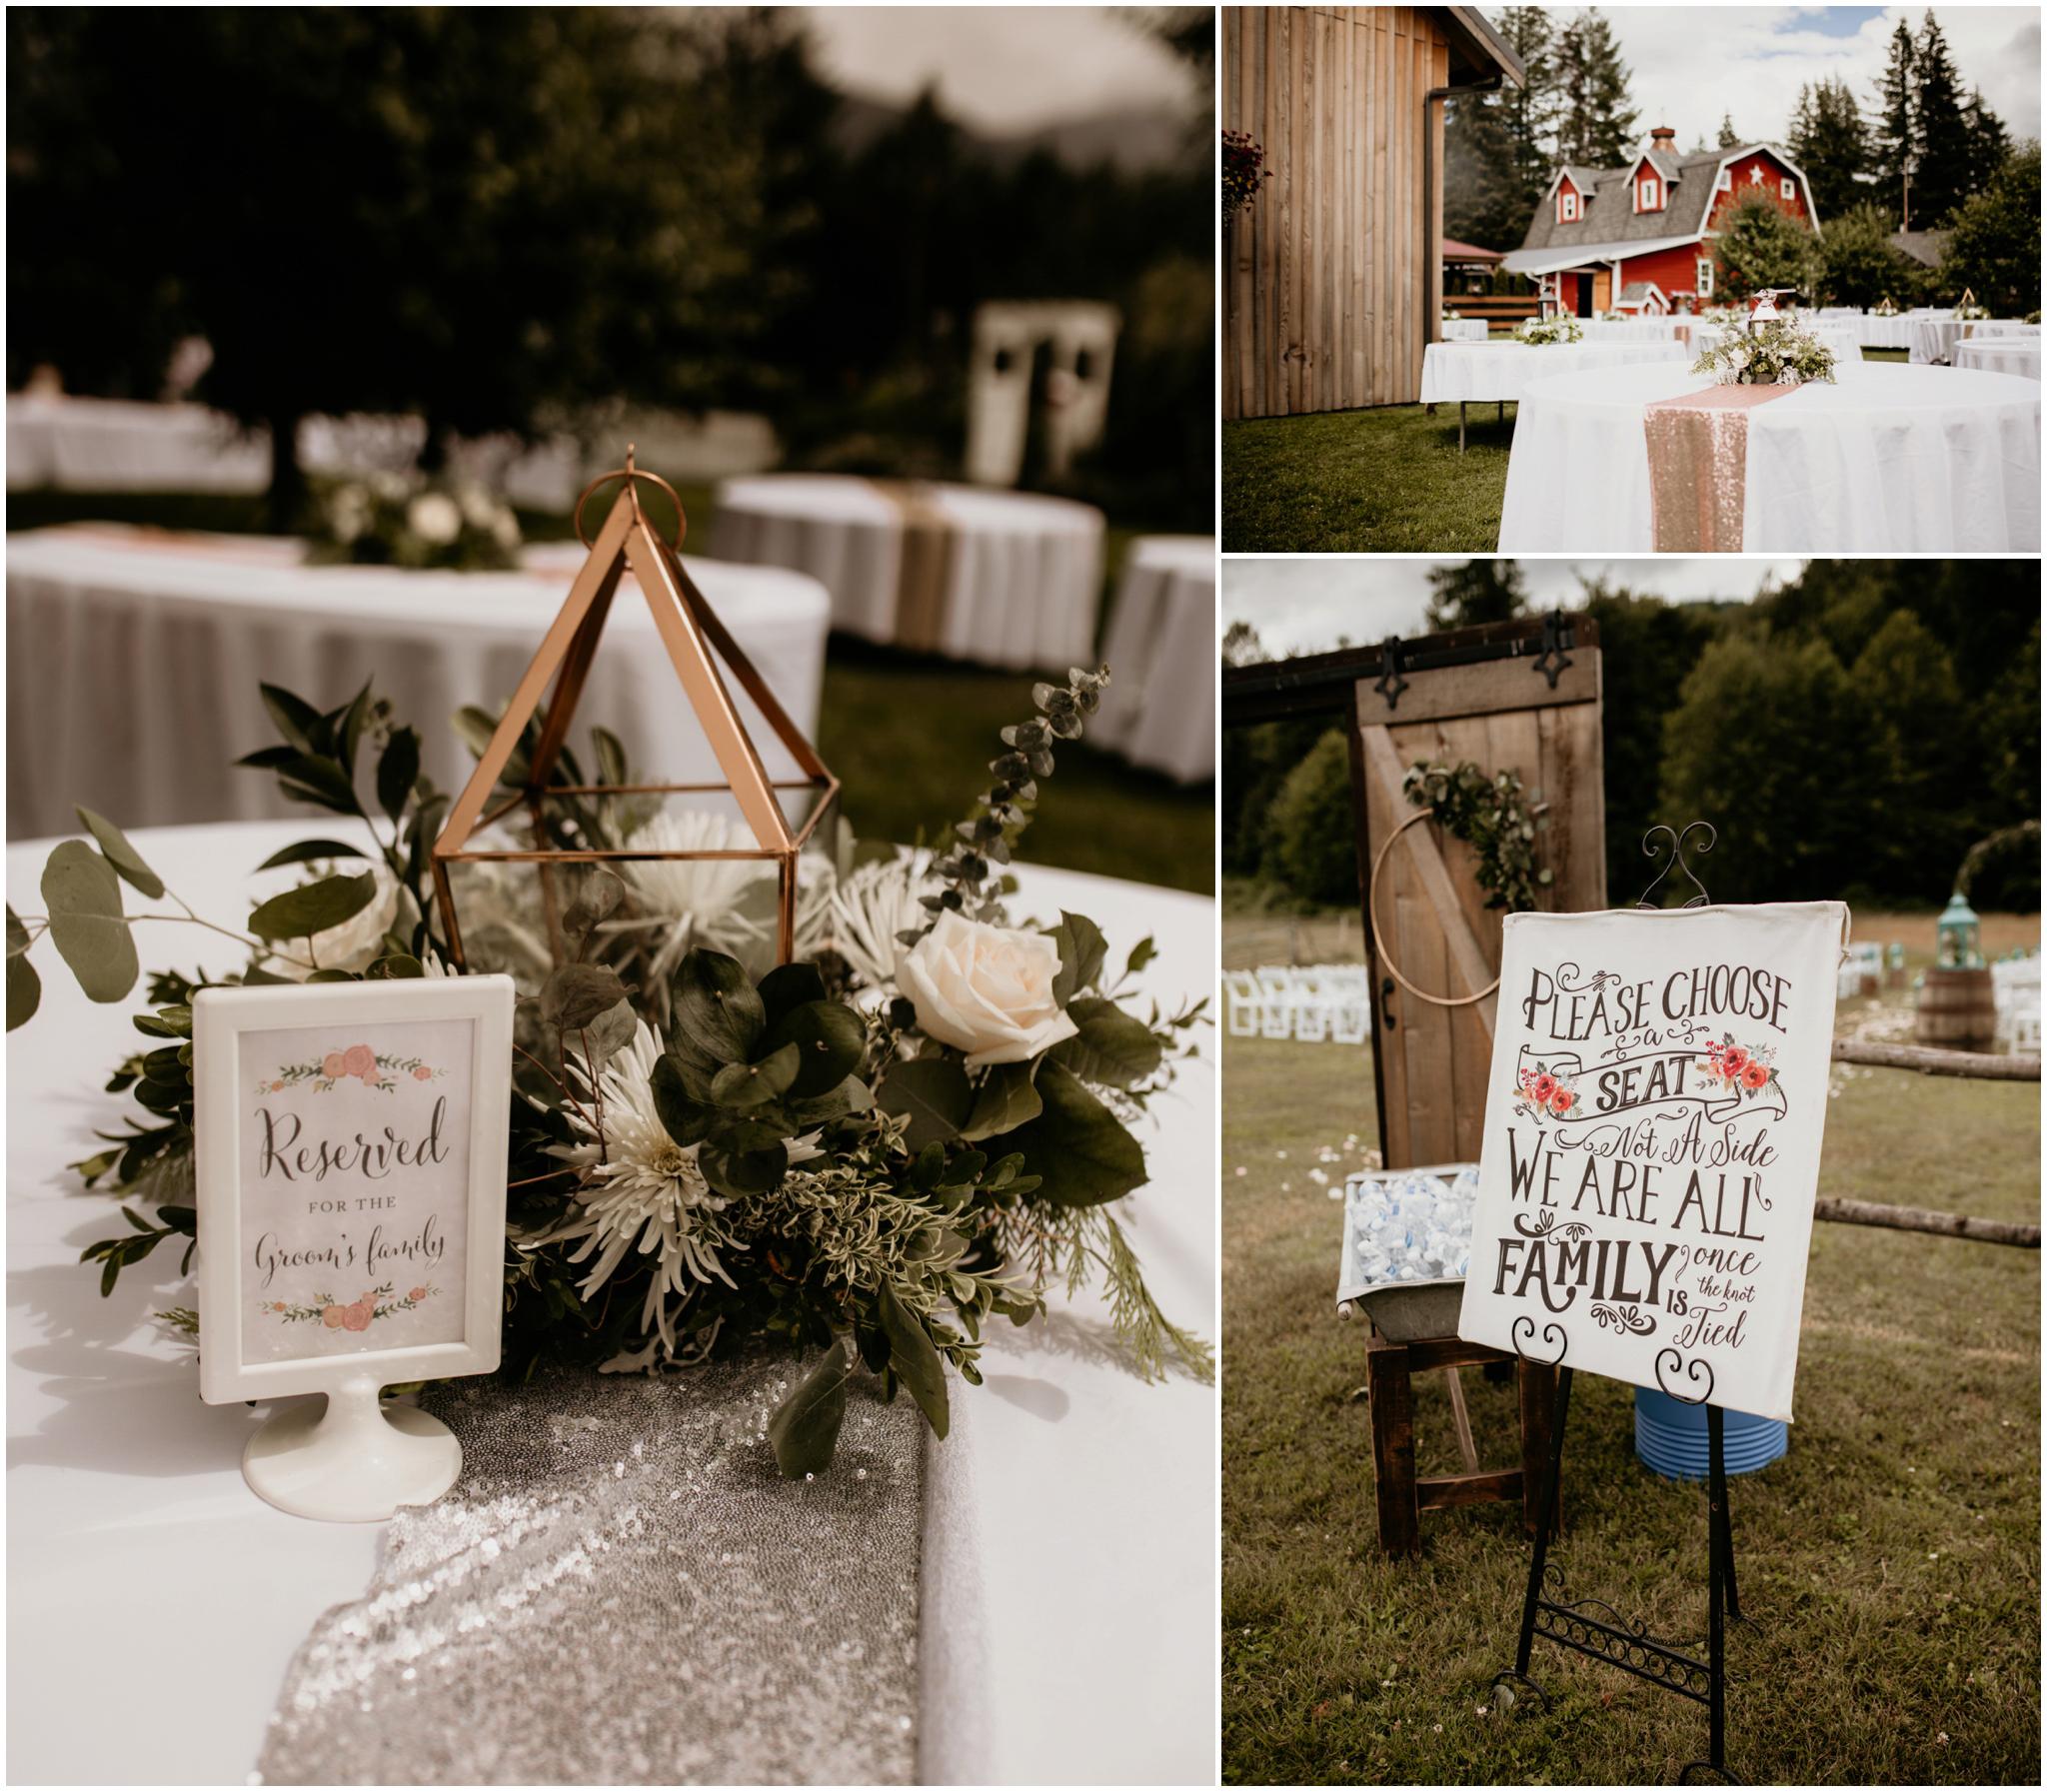 alex-and-matthew-three-cs-farm-venue-seattle-wedding-photographer-086.jpg